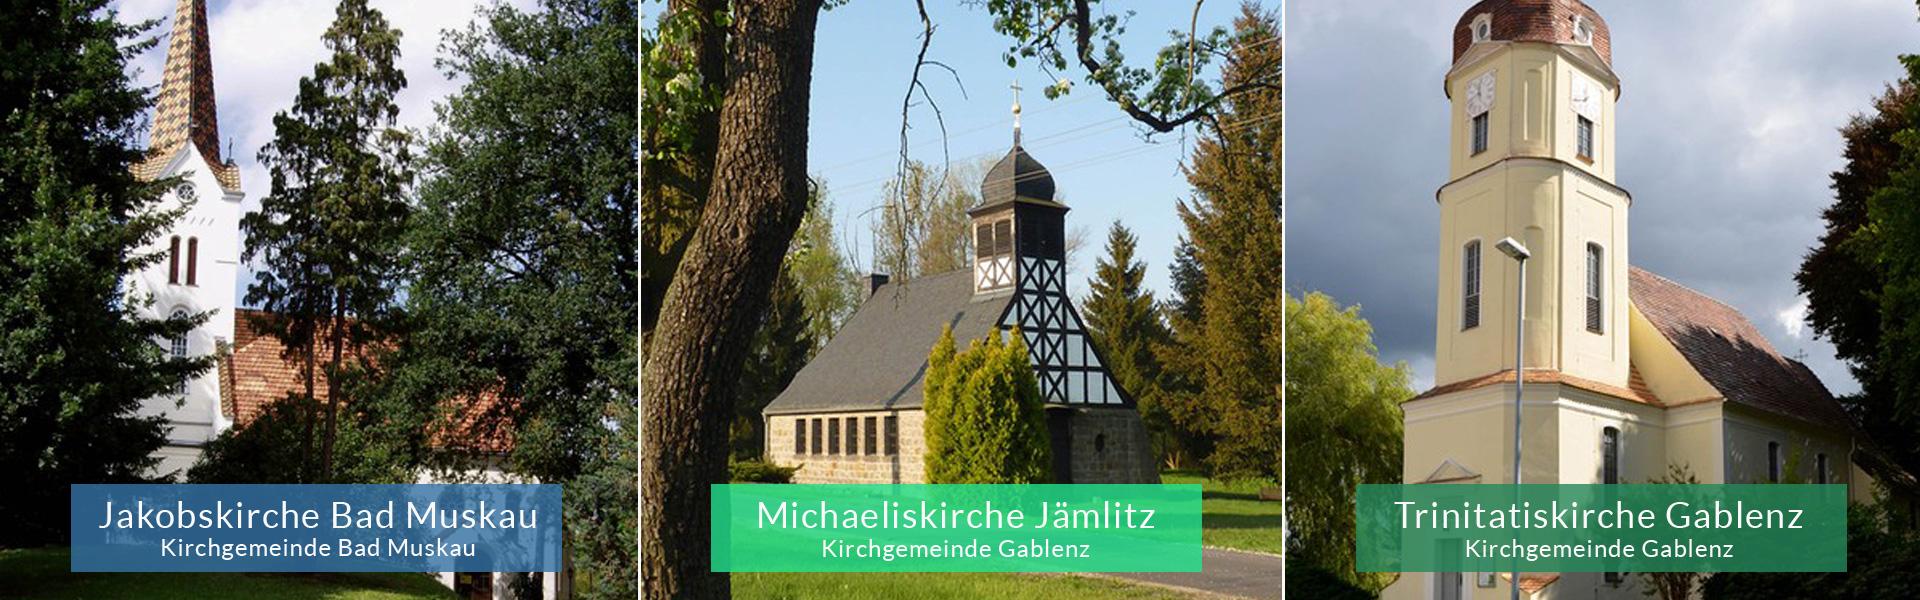 Kirchgemeinde Bad Muskau Gablenz